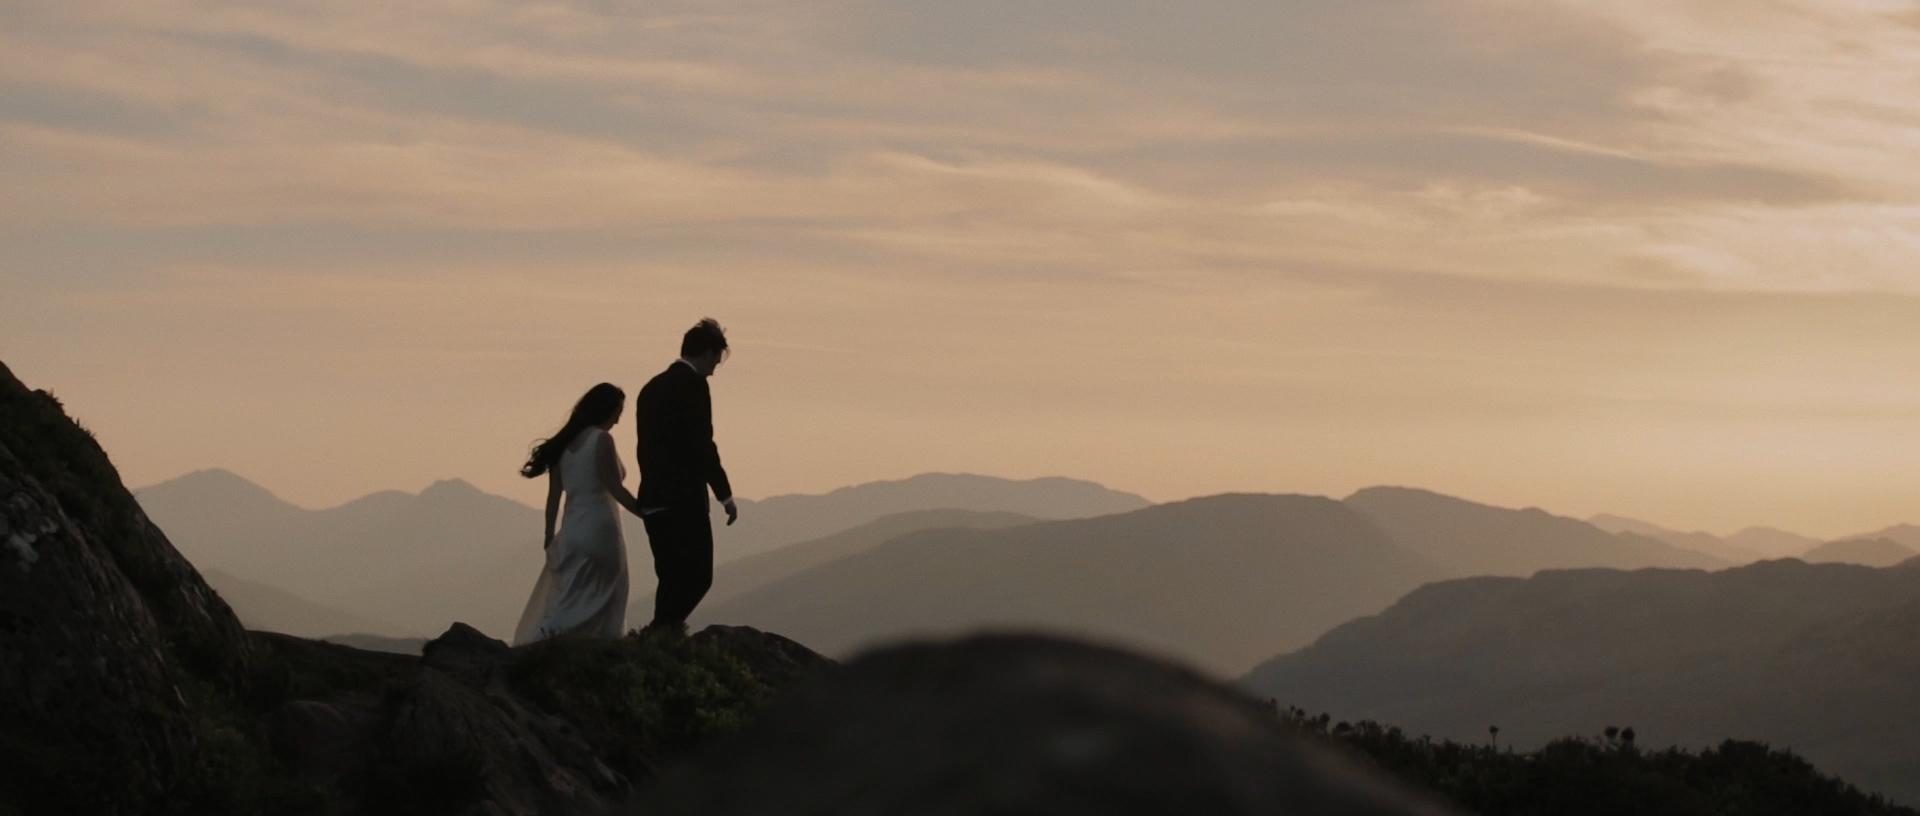 kippilaw-house-wedding-videographer_LL_01.jpg